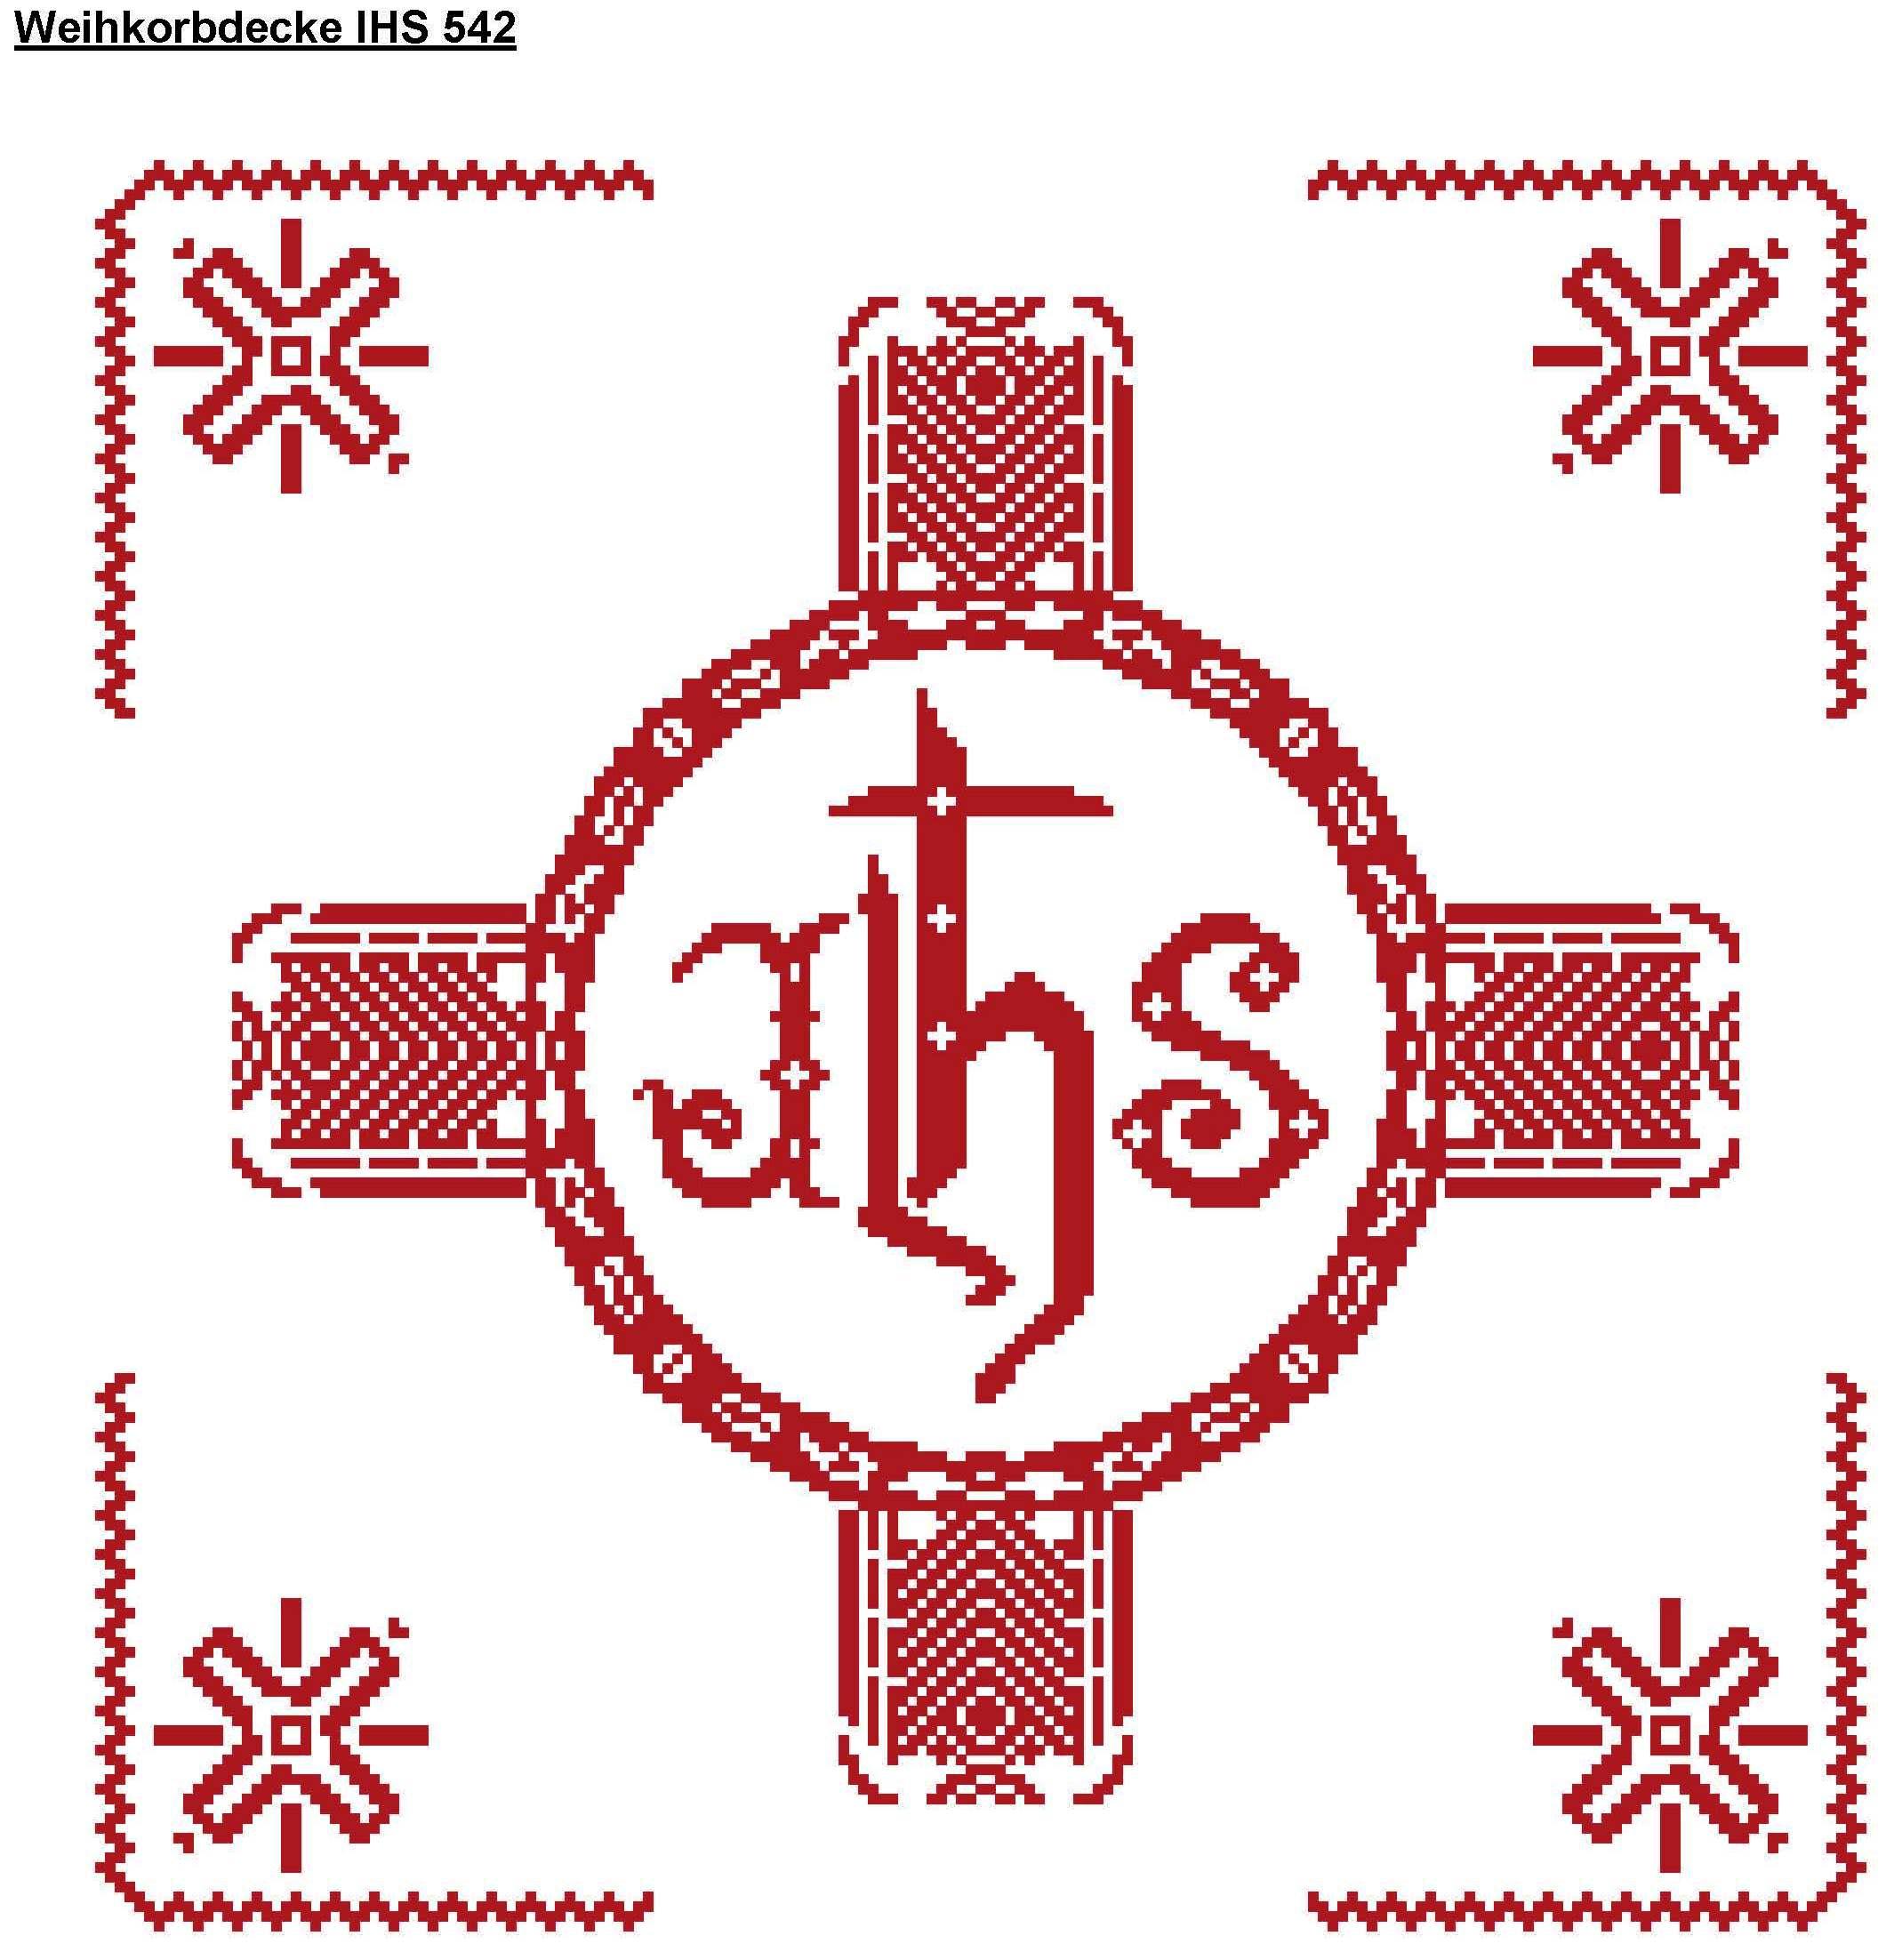 Weihkorbdecke - IHS 542